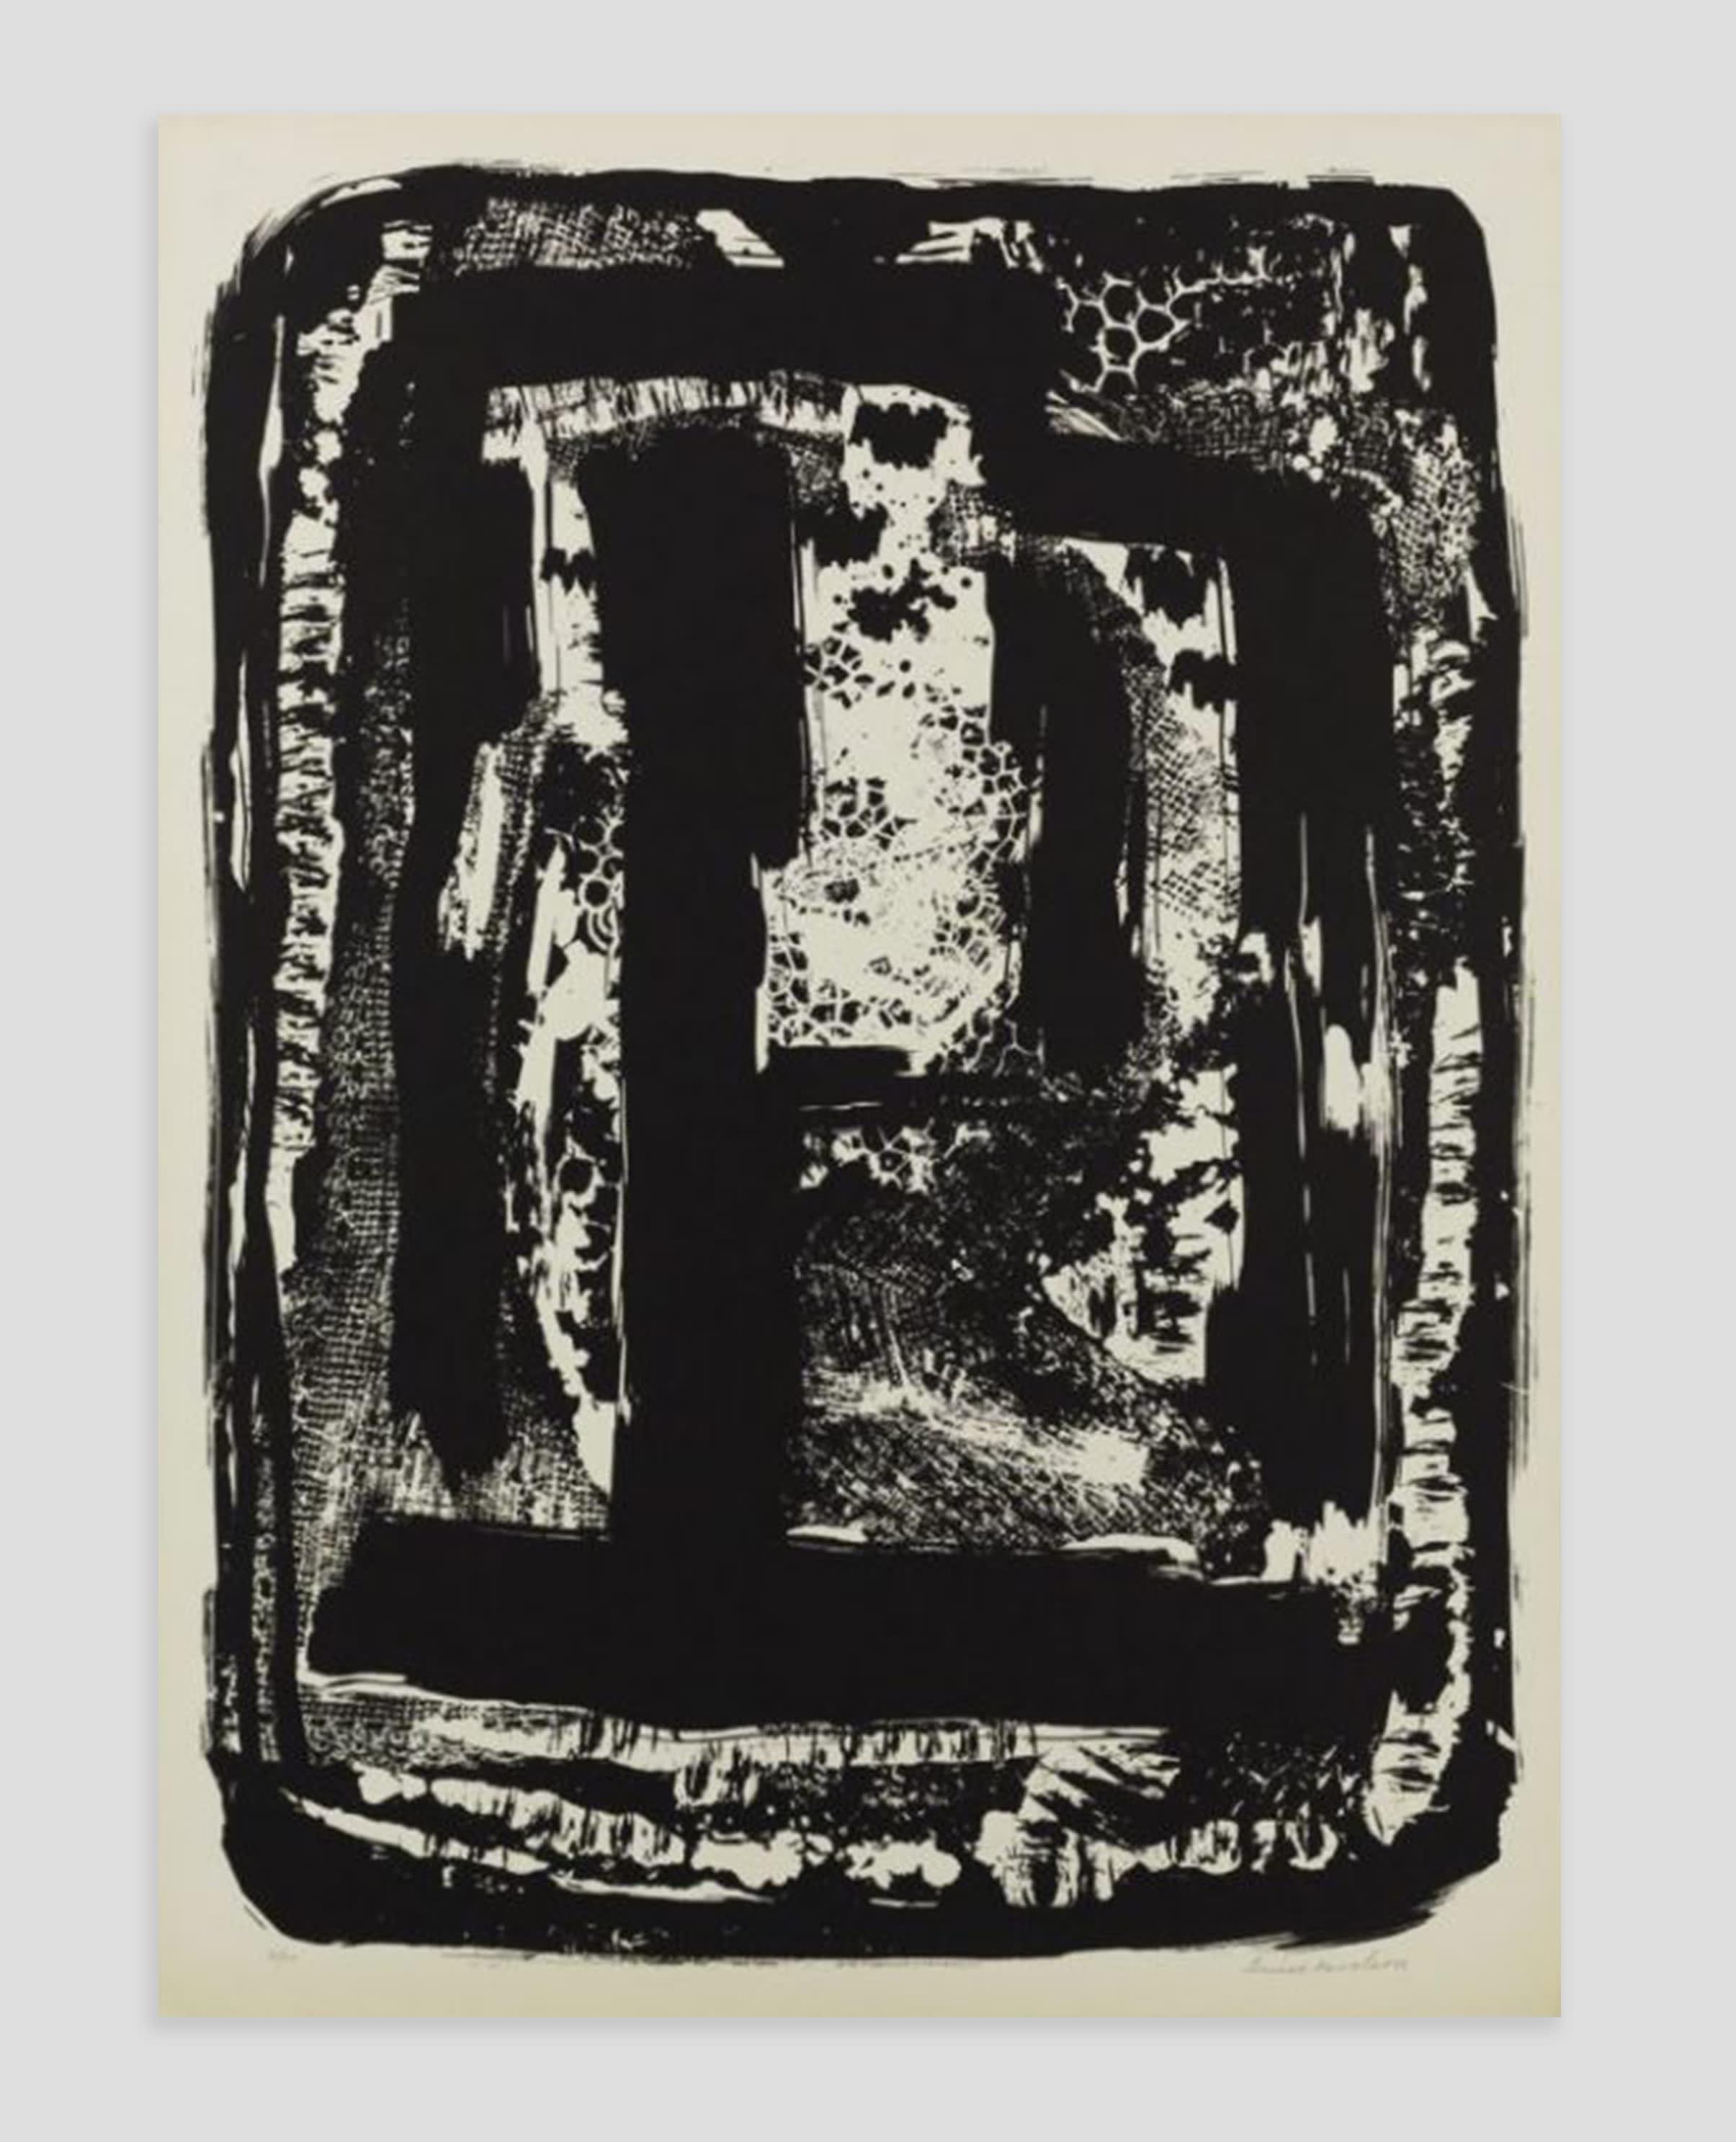 Fine Art Print by Louise Nevelson at Zane Bennett Contemporary Art